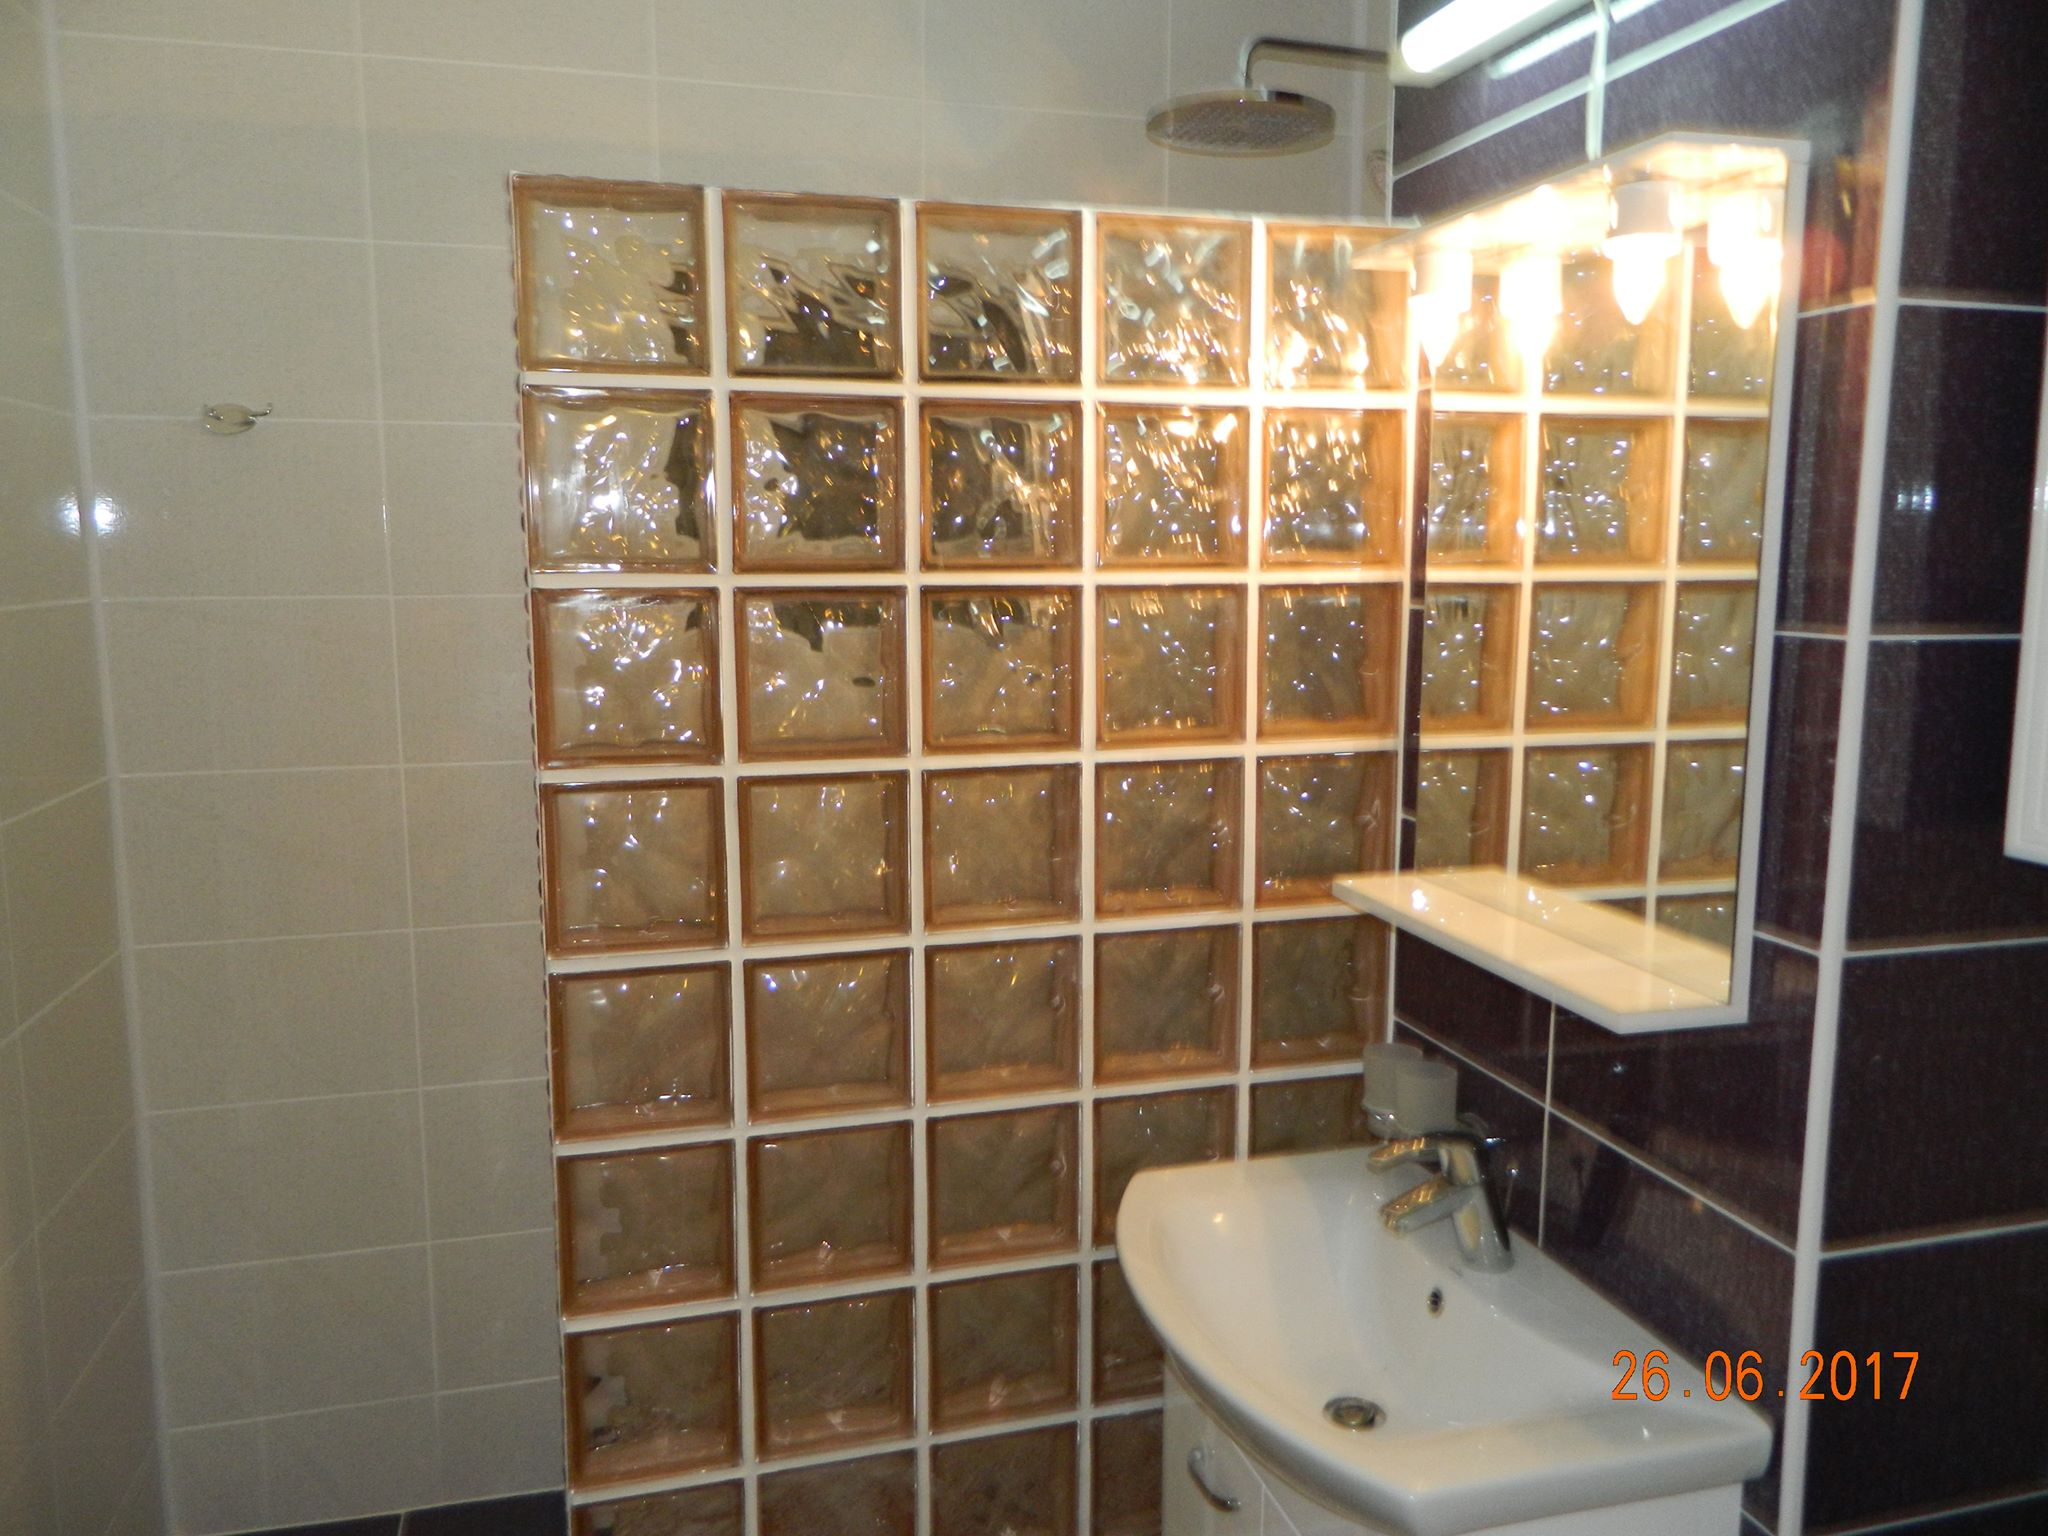 Cabina Dus Caramida Sticla.Renovare Baie Cabina Dus Construita Mozaic Caramizi Sticla Amenajare Baie Bucatarie Amenajari Interioare Ploiesti